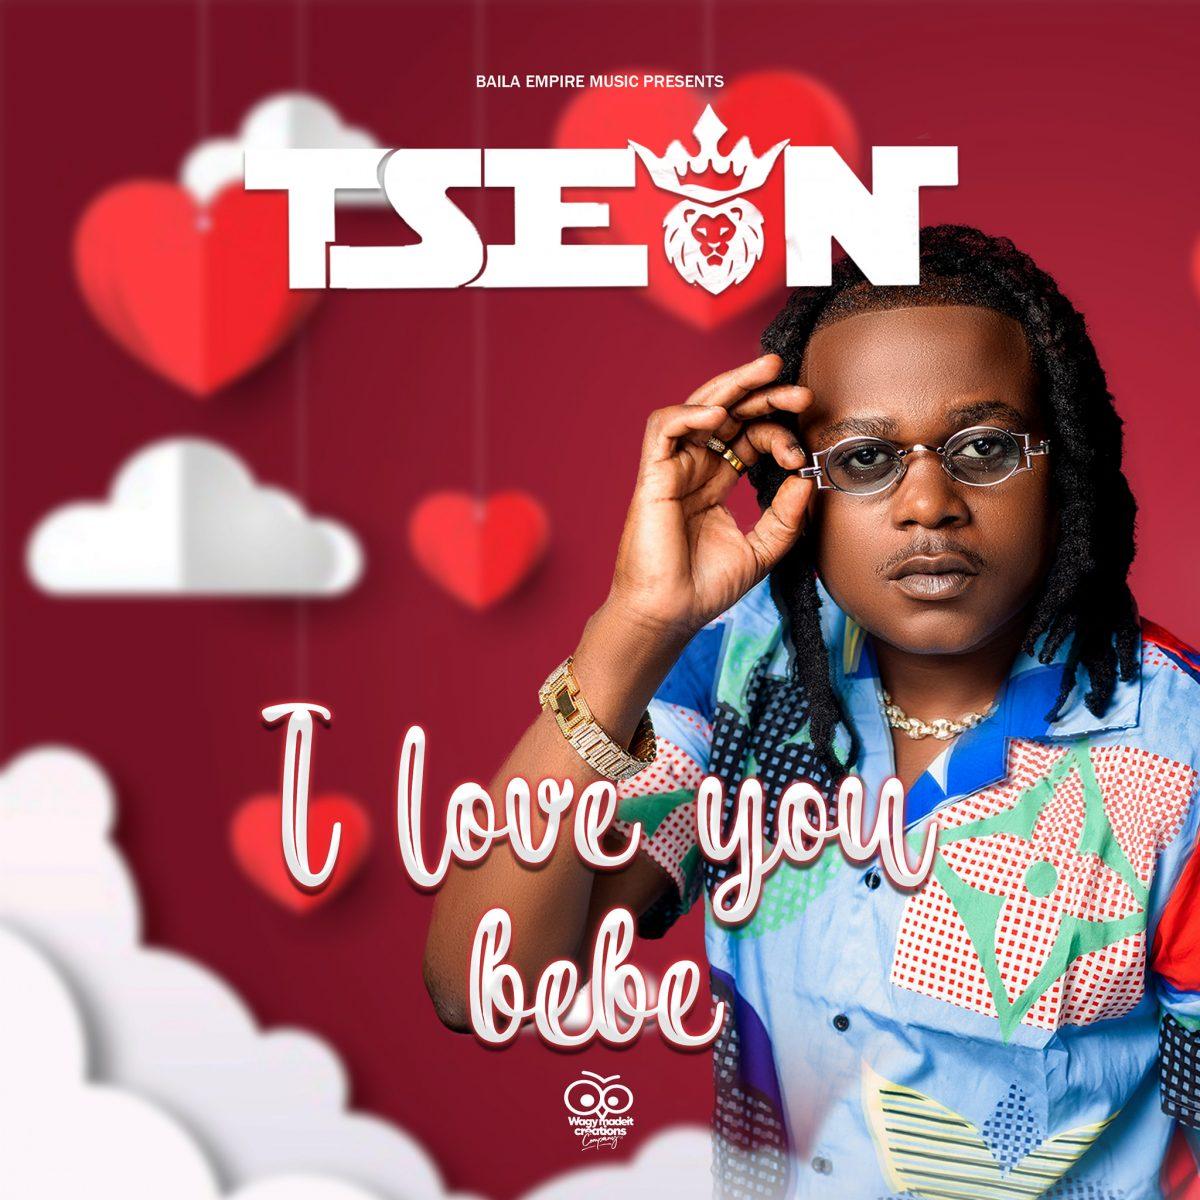 T-Sean - I Love You Bebe